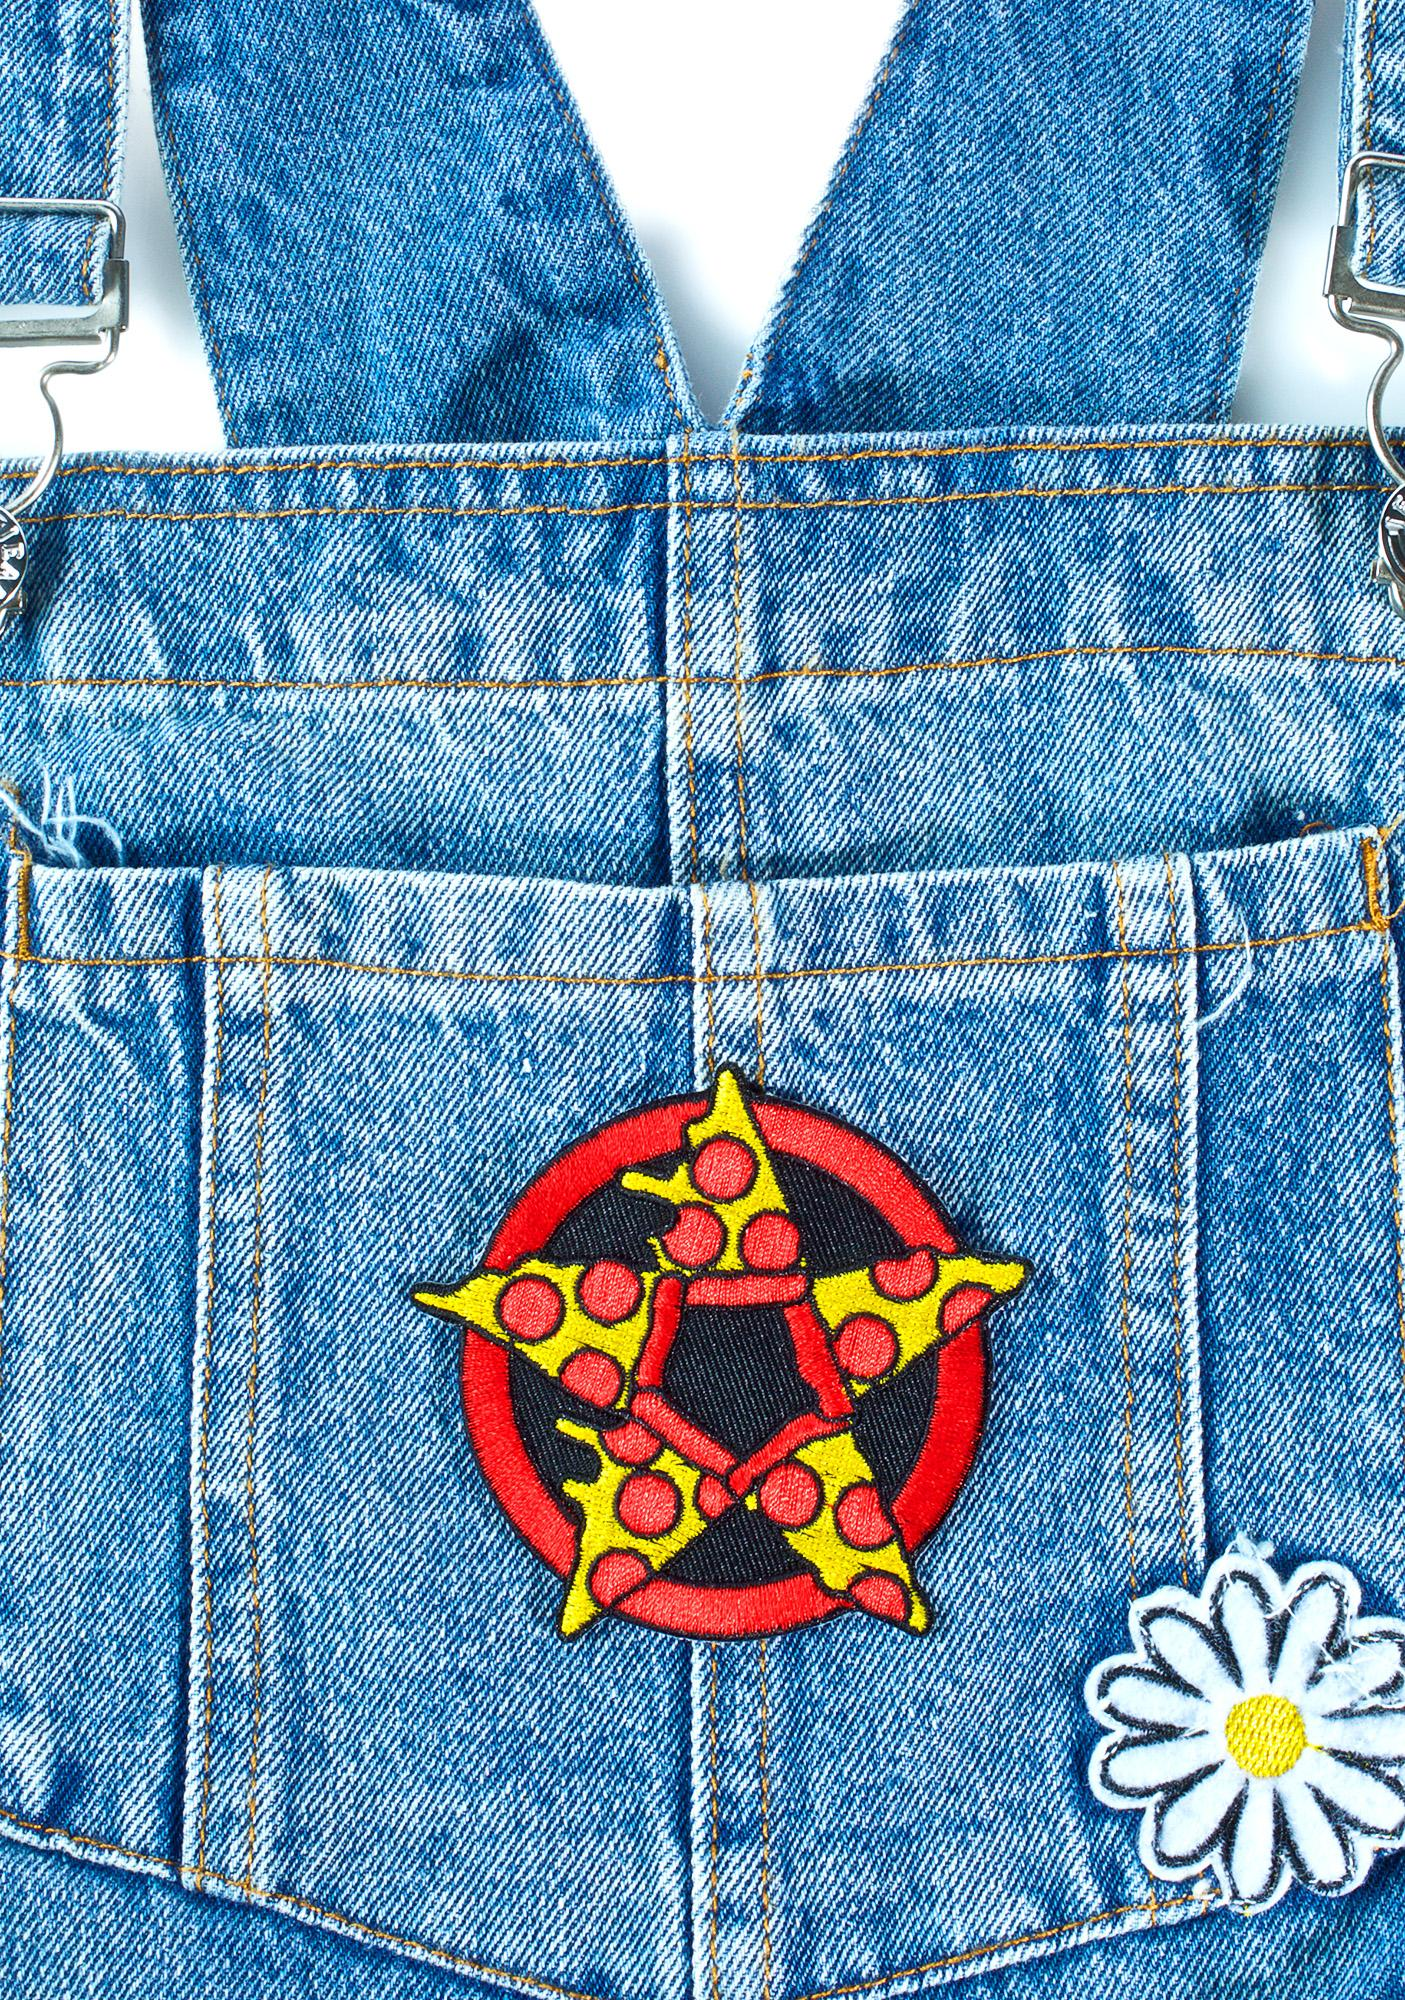 Sourpuss Clothing Pizza Pentagram Patch